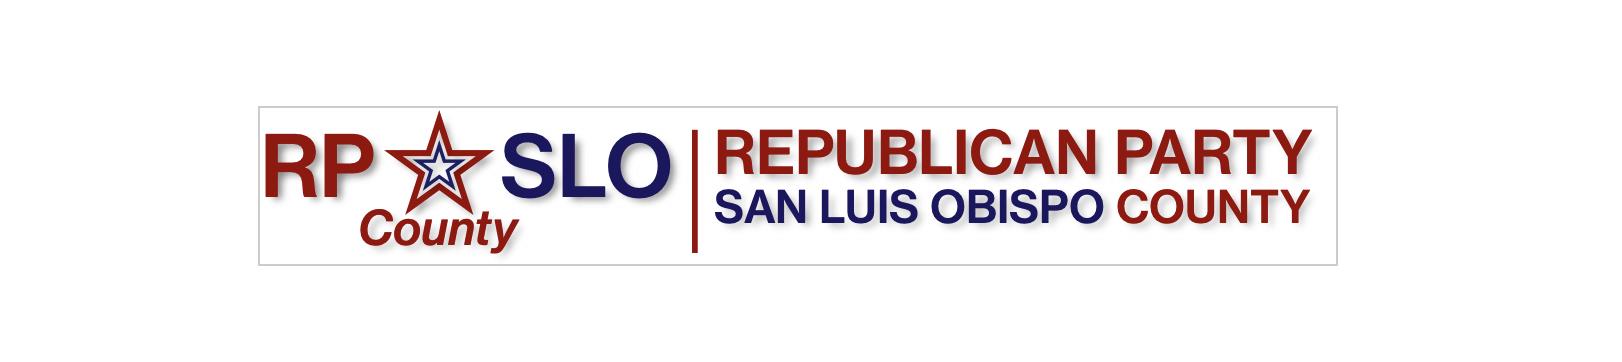 San Luis Obispo County Republican Party